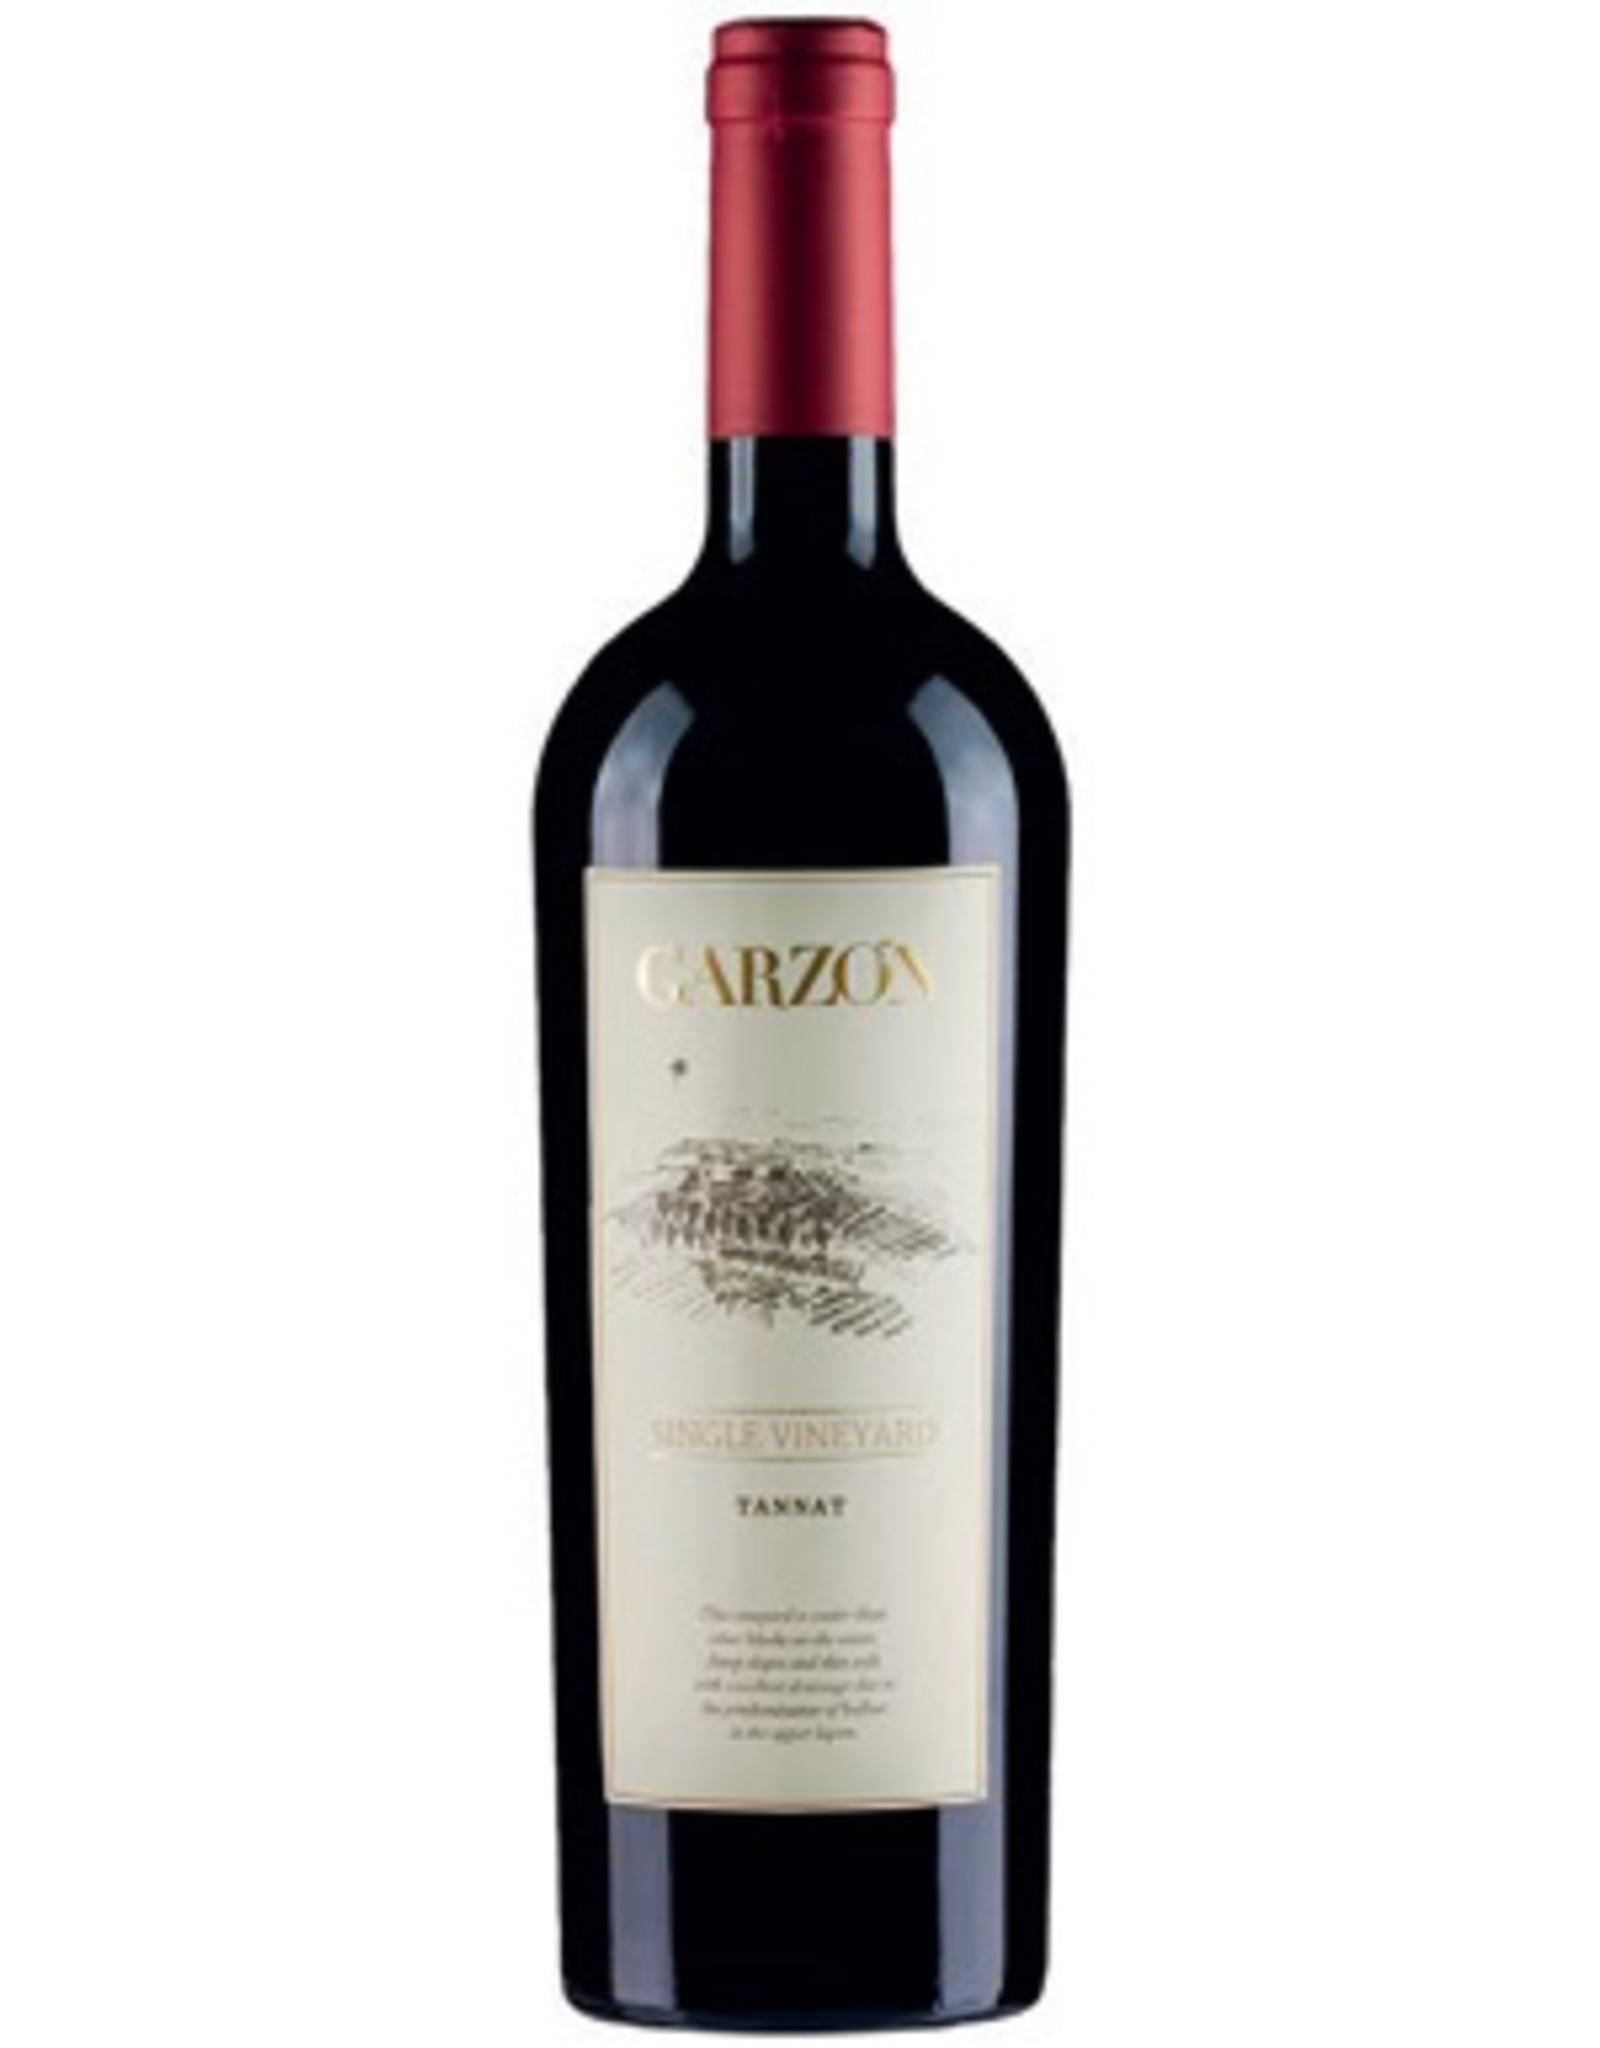 Red Wine 2018, Garzon Single Vineyard, Tannat, Garzon, Garzon, Uruguay, 14.5% Alc, CTnr, JS92, TW93